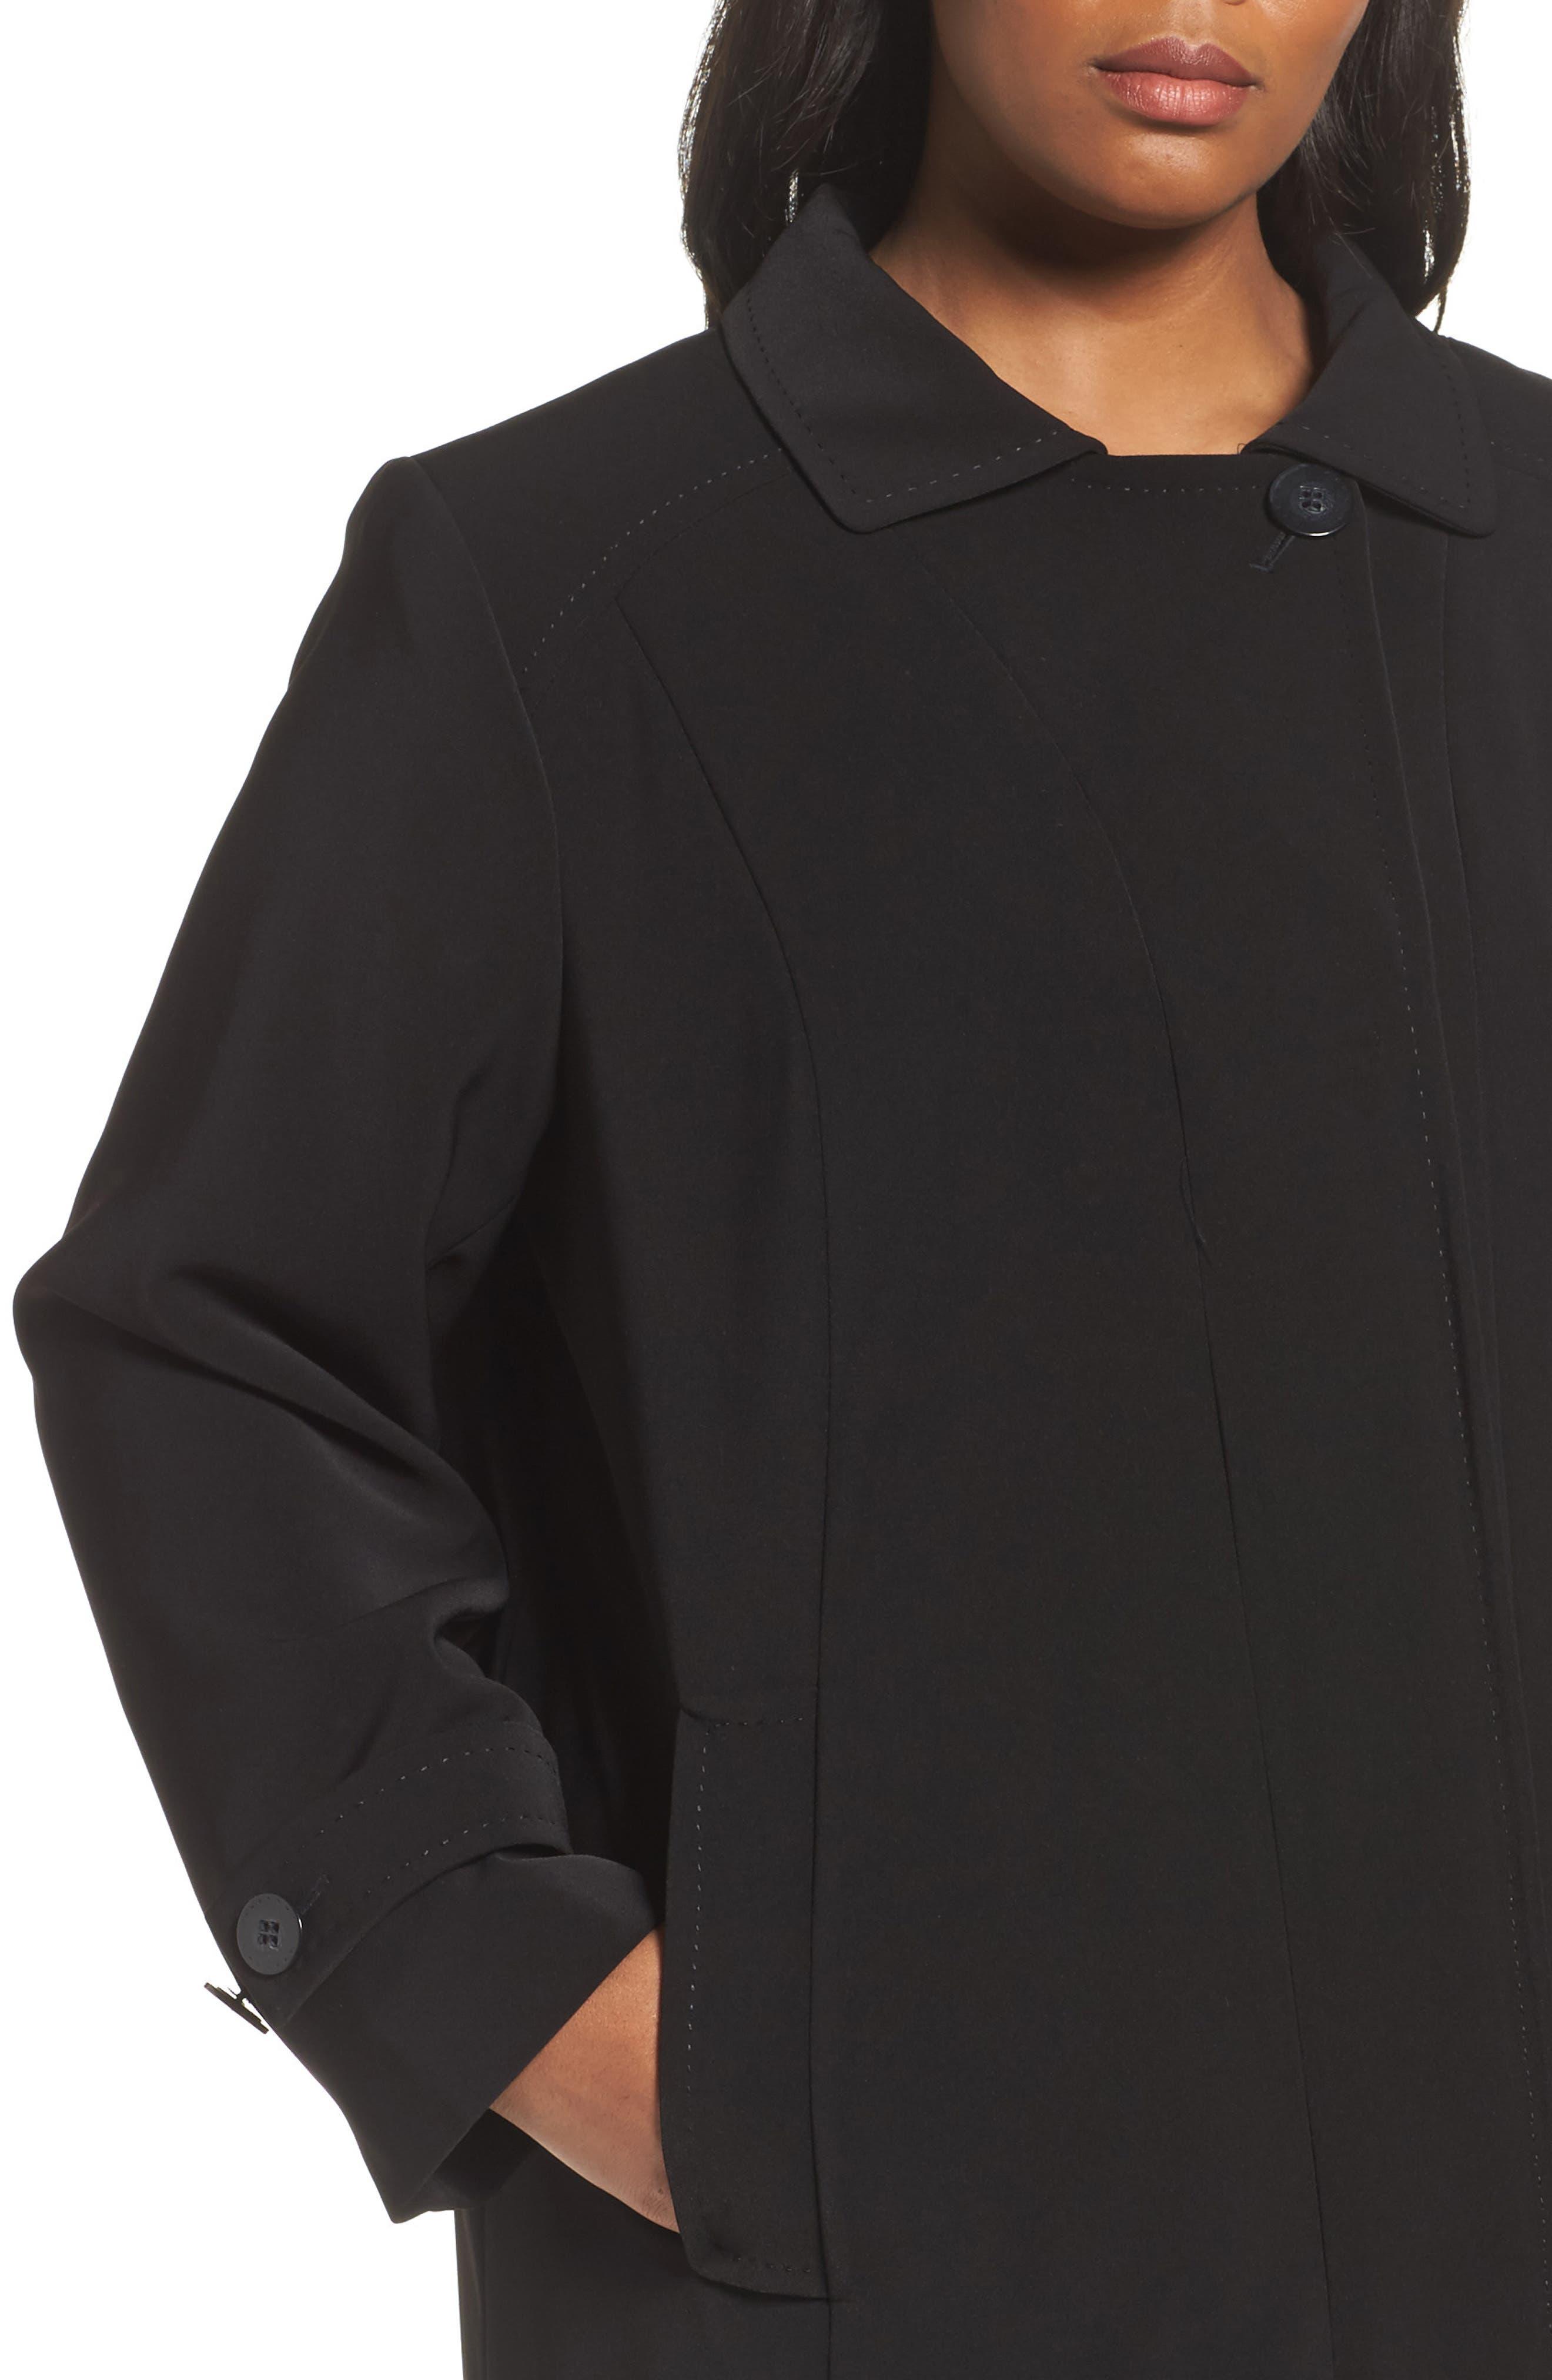 A-Line Raincoat with Detachable Hood & Liner,                             Alternate thumbnail 4, color,                             001